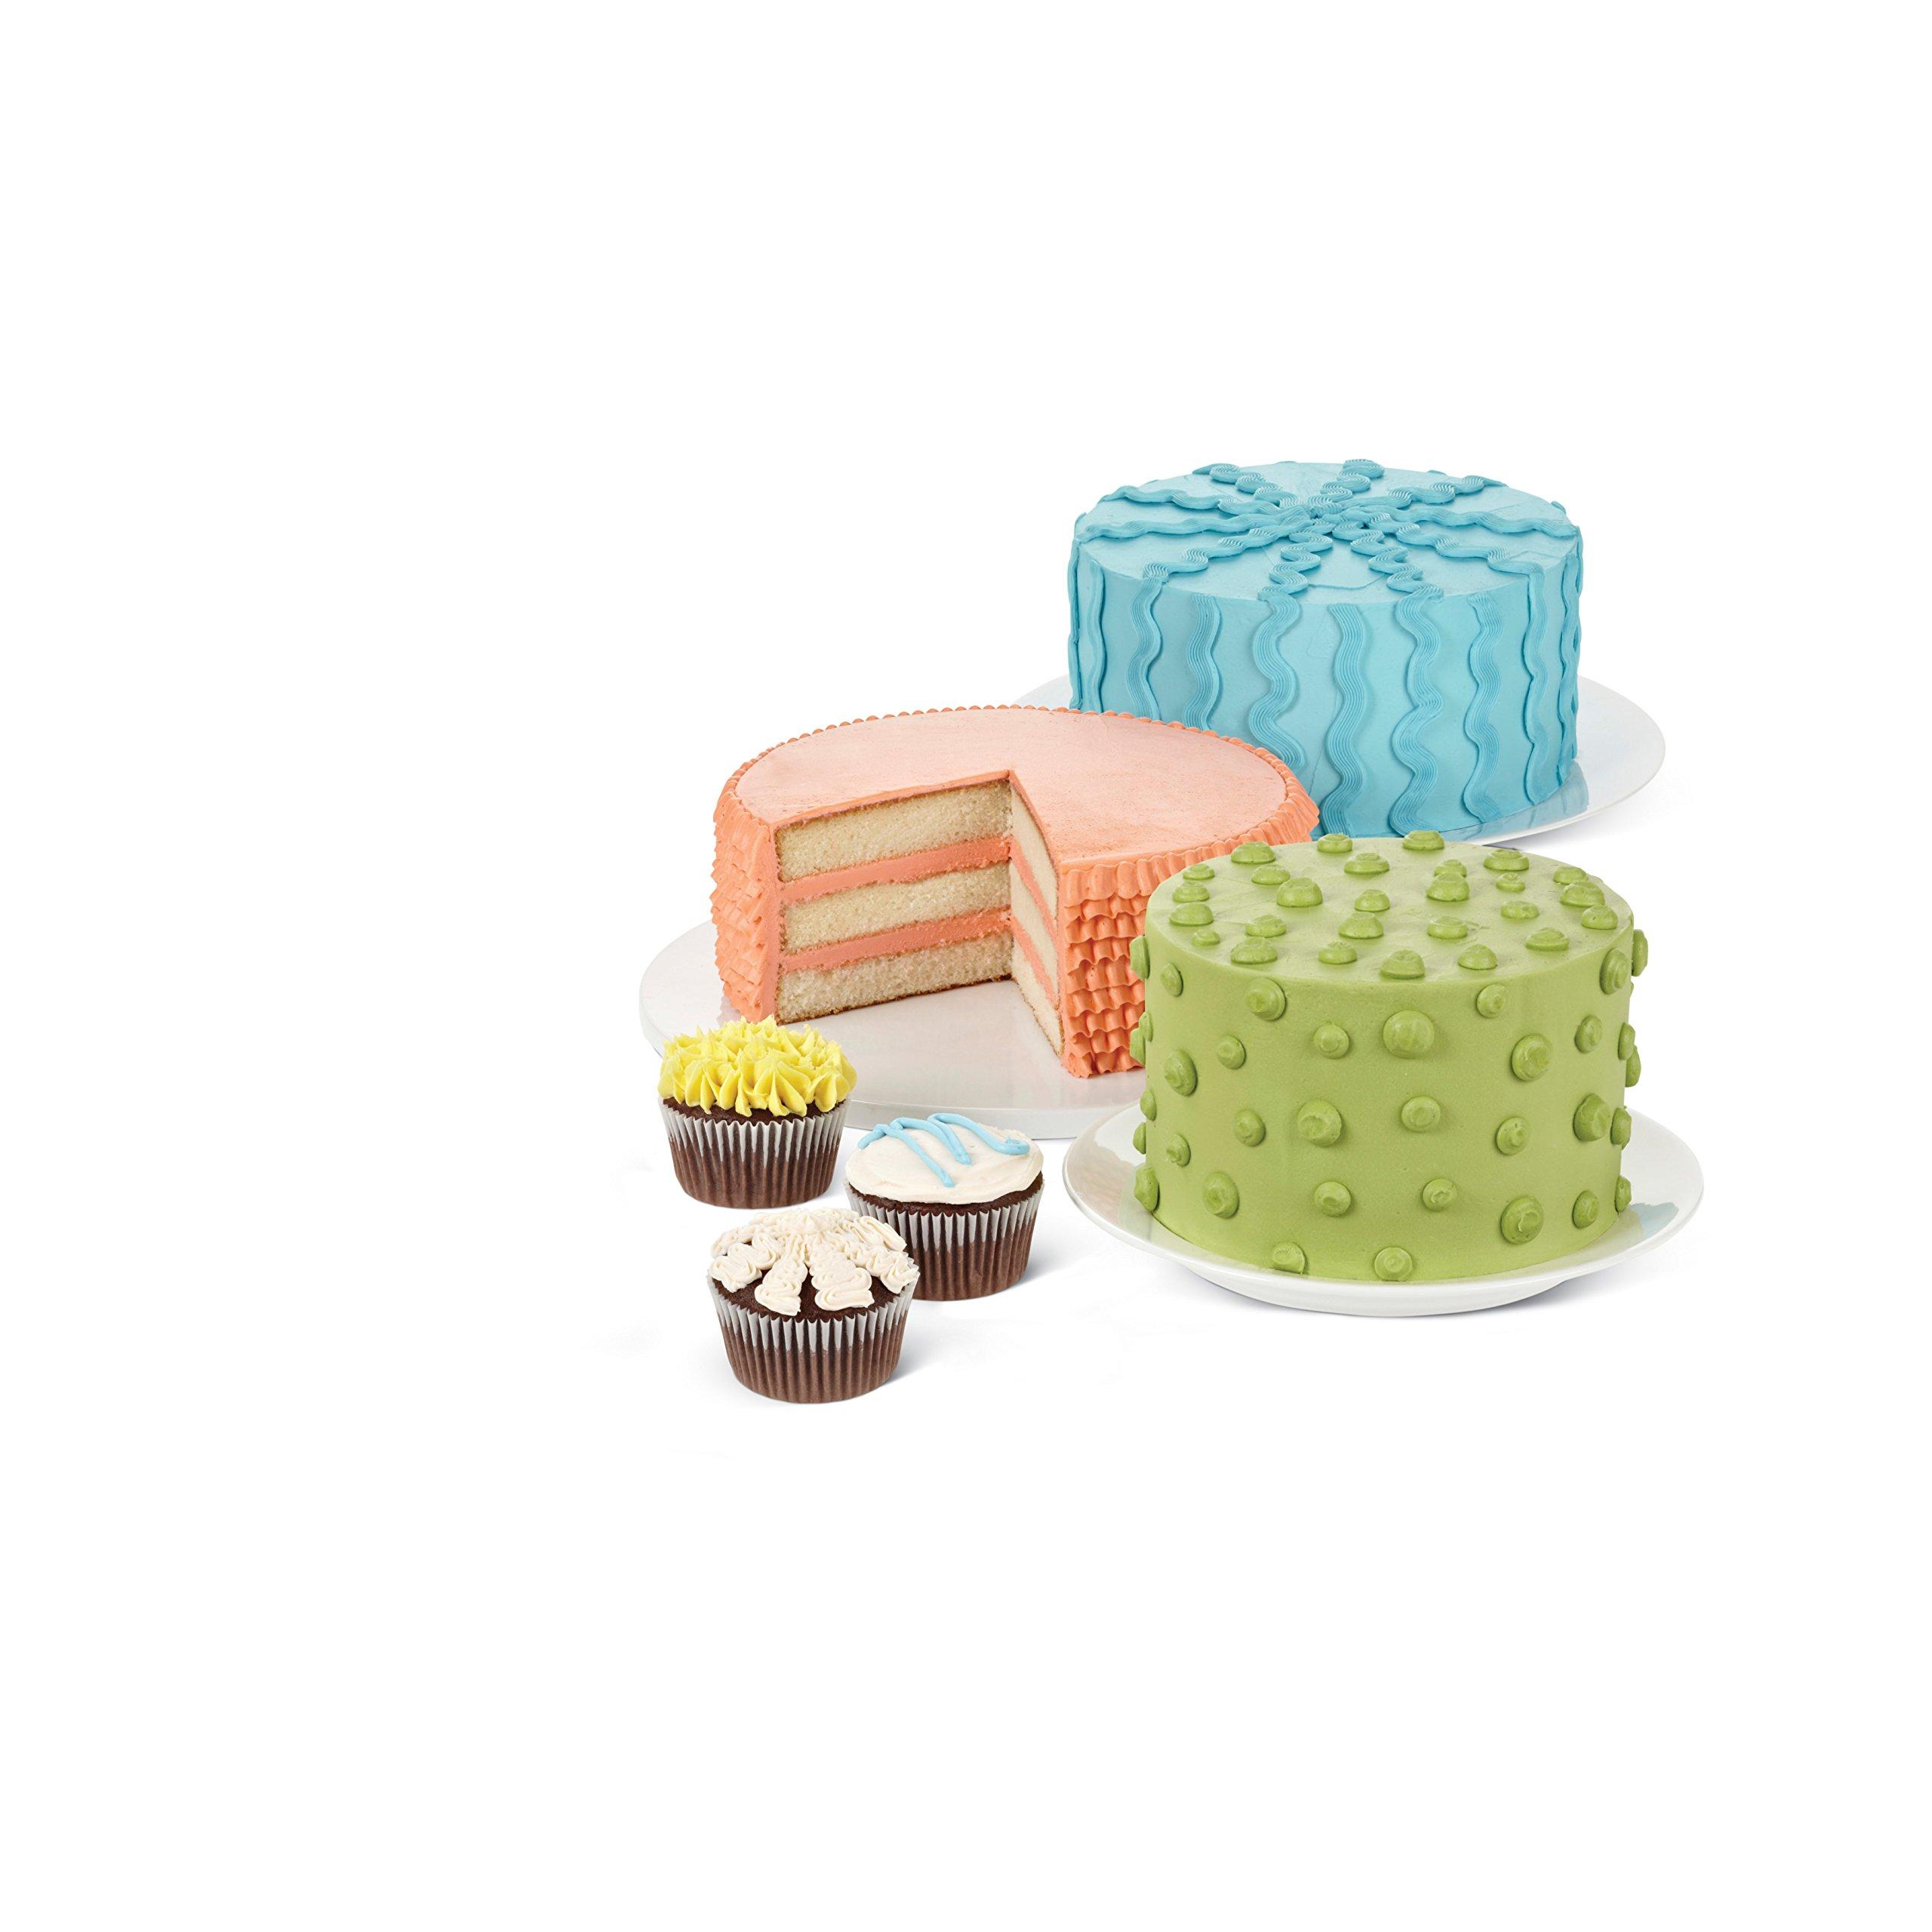 Wilton 46-Piece Deluxe Cake Decorating Set, Cake ...